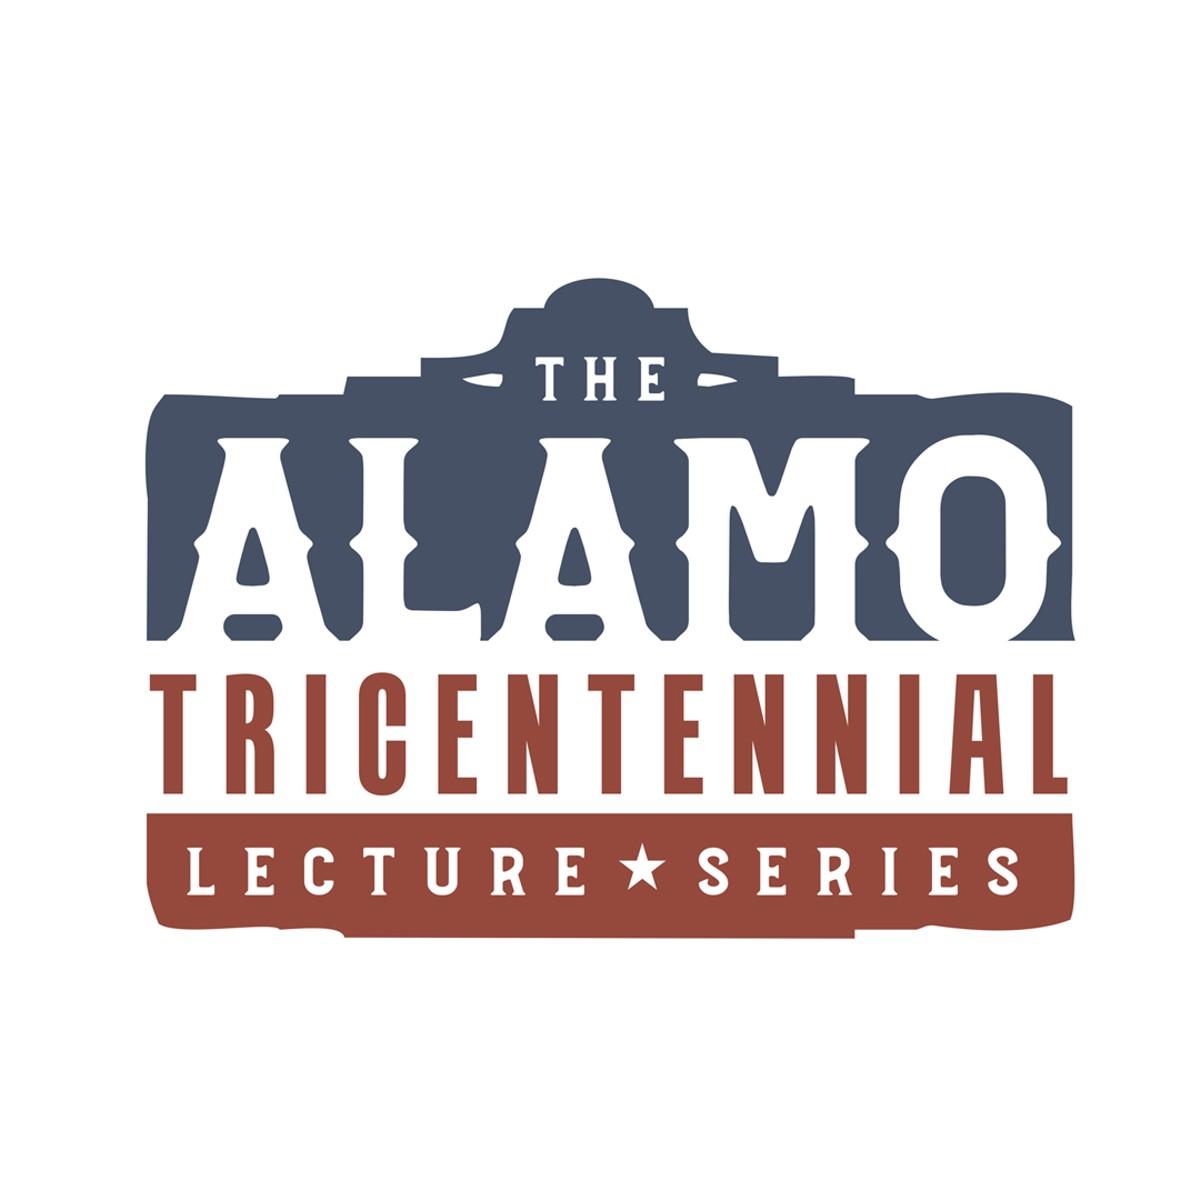 2018_lecture_series_logo_1080x1080.jpg